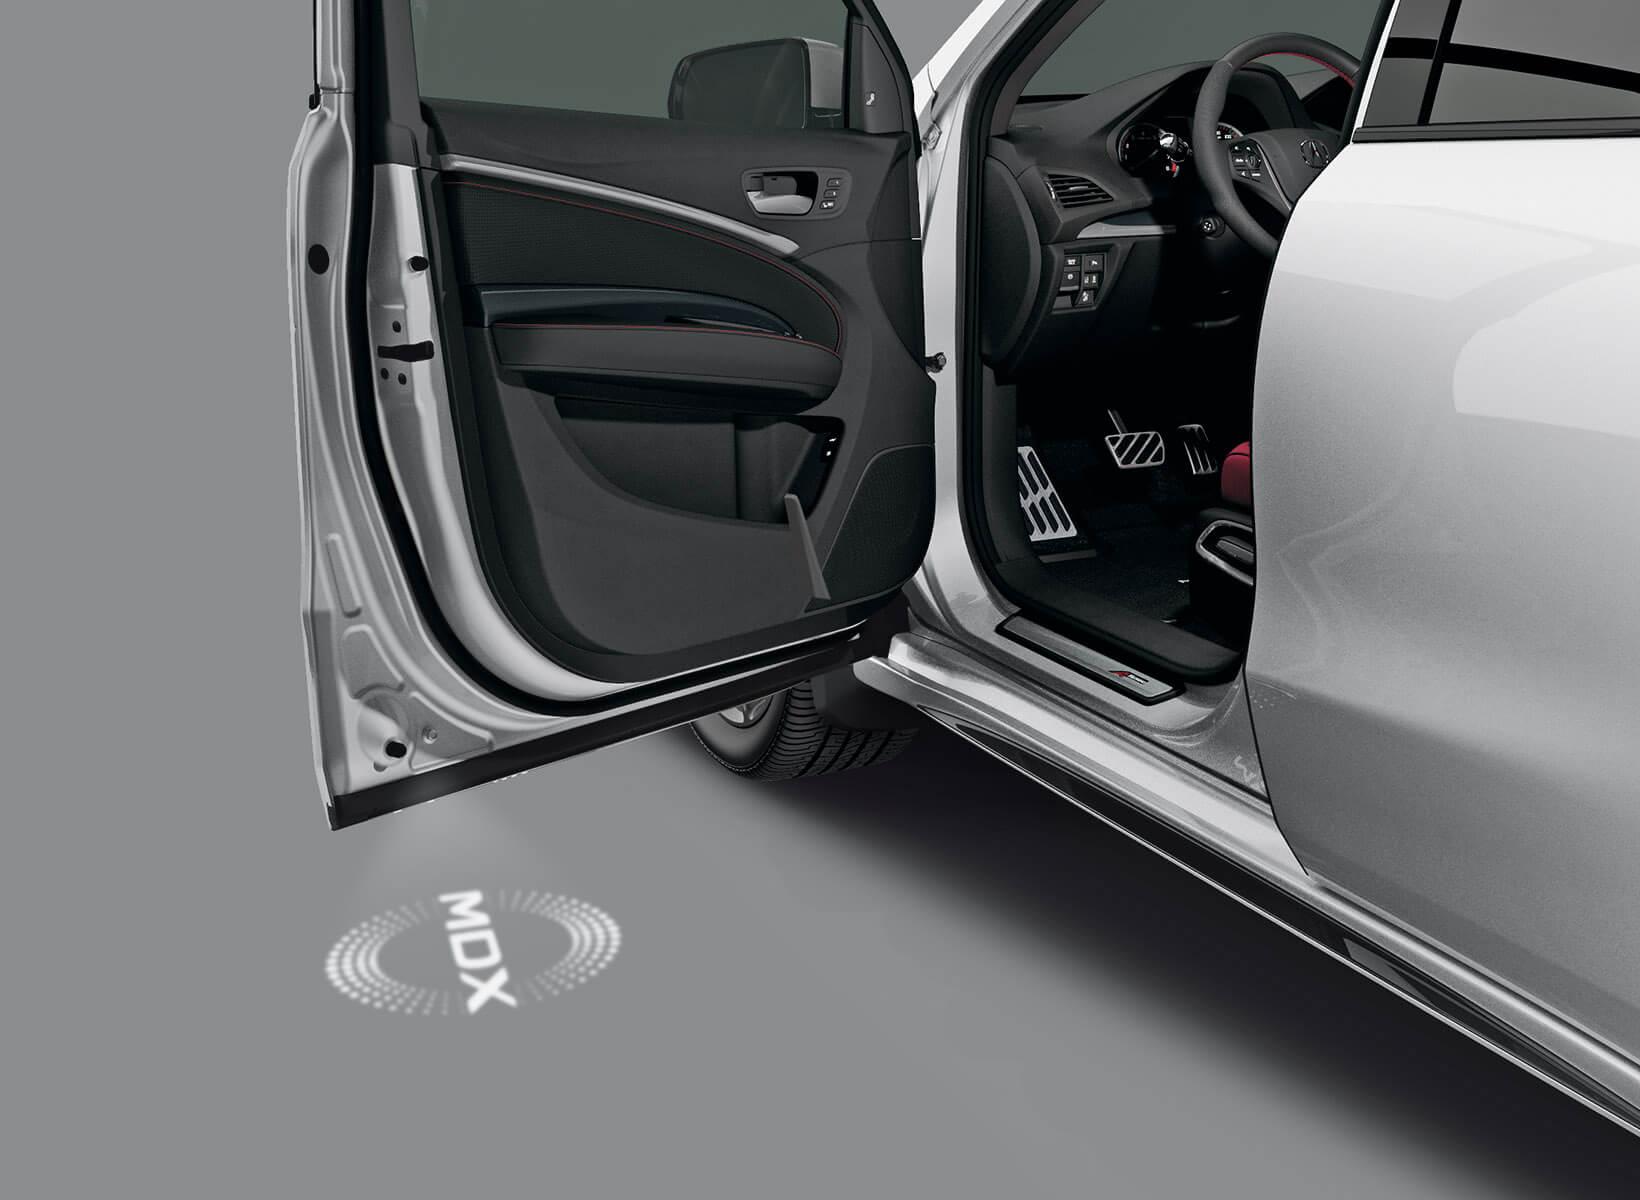 Accessories MDX Acura Canada - Acura mdx roof cargo box